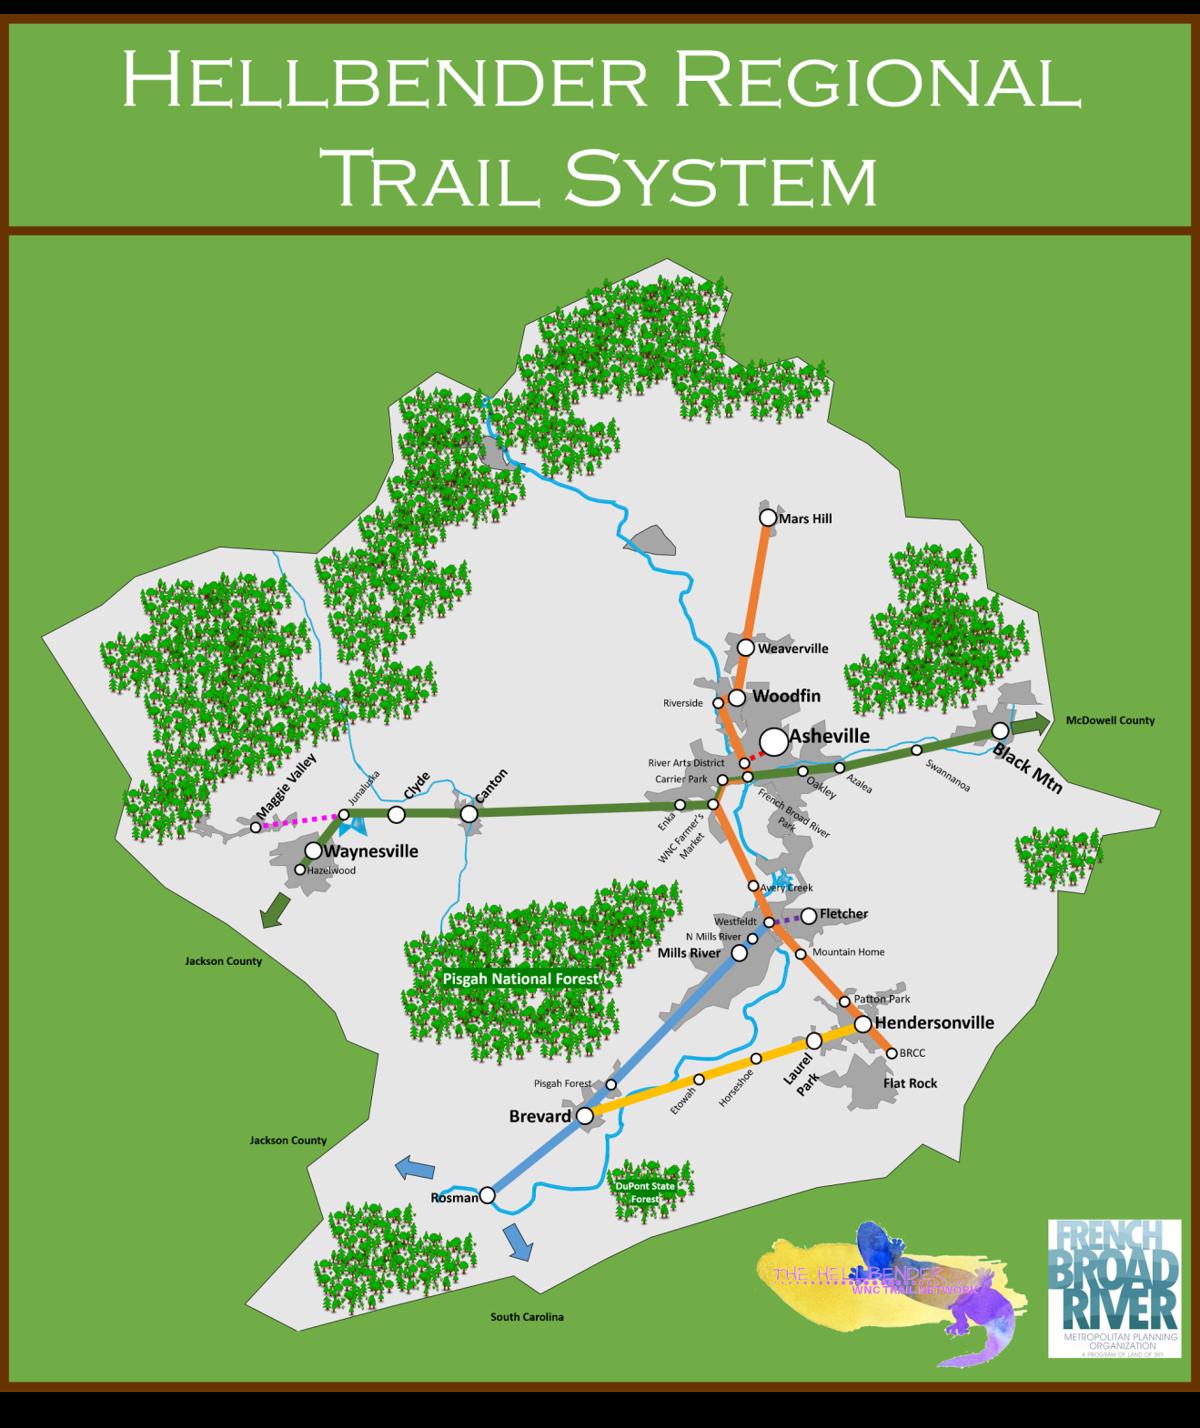 Hellbender Regional Trail map